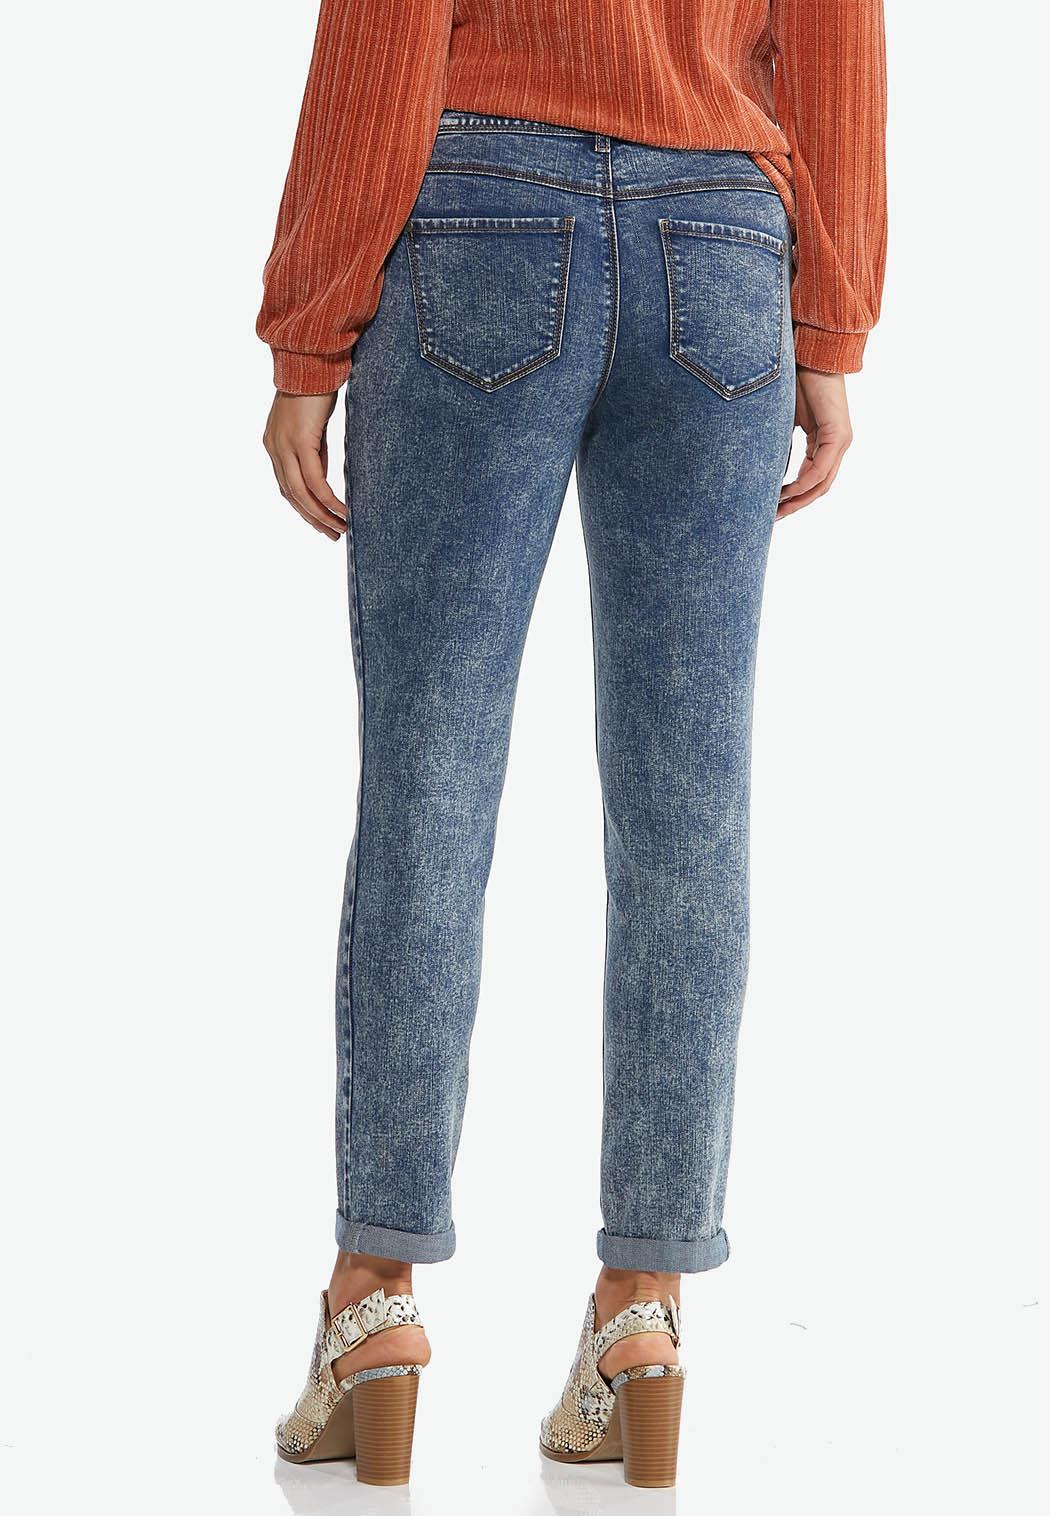 Acid Wash Girlfriend Jeans (Item #44449702)